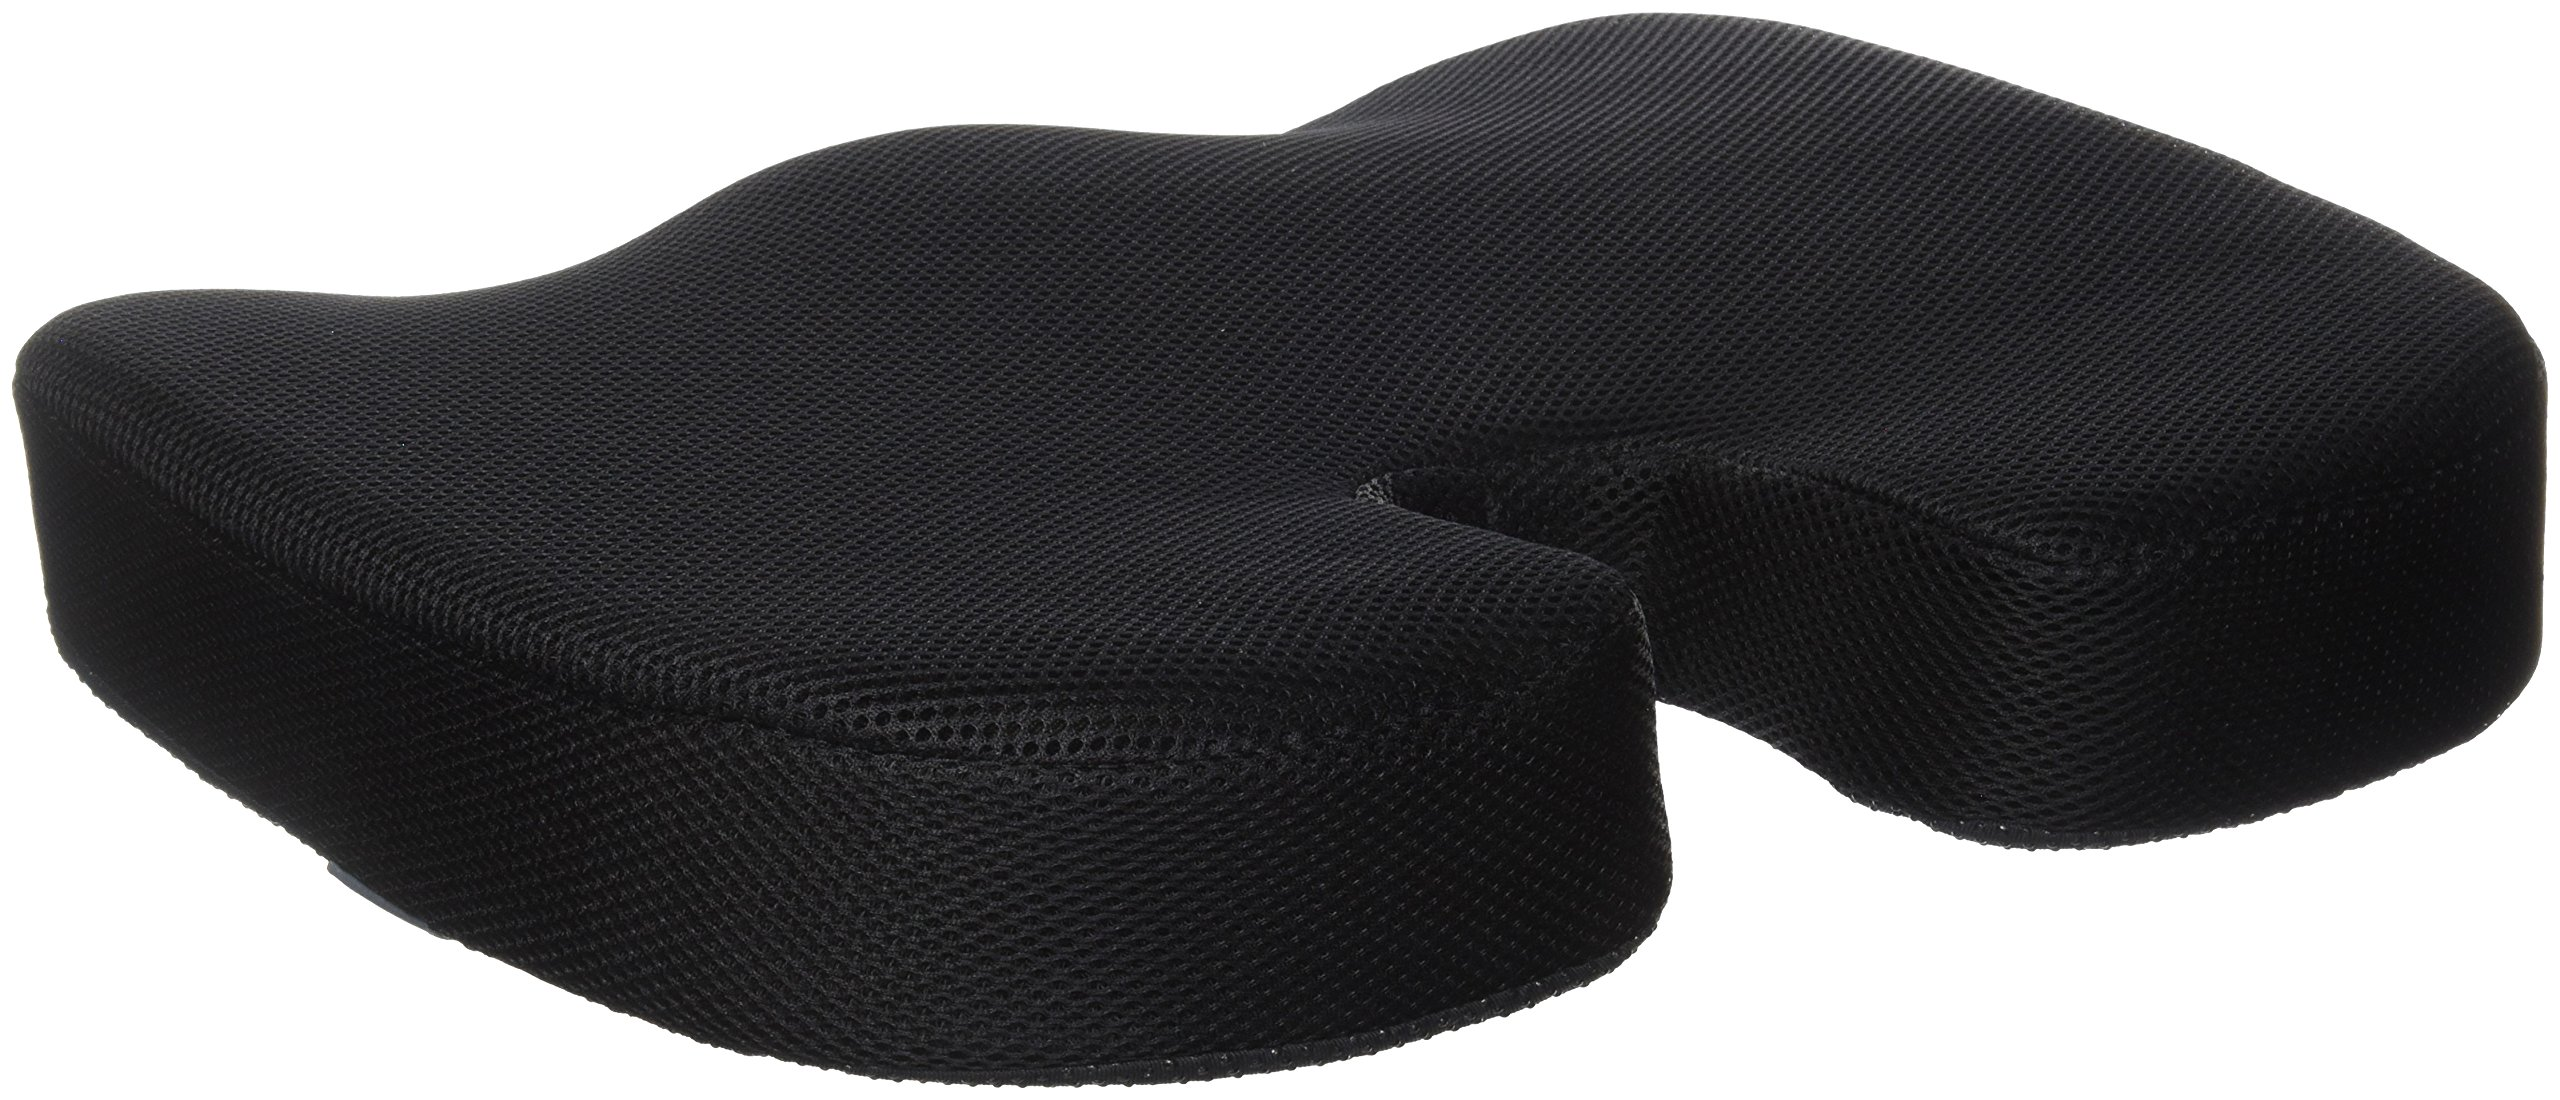 Duro-Med DMI Memory Foam Coccyx Seat Cushion Pillow, Black